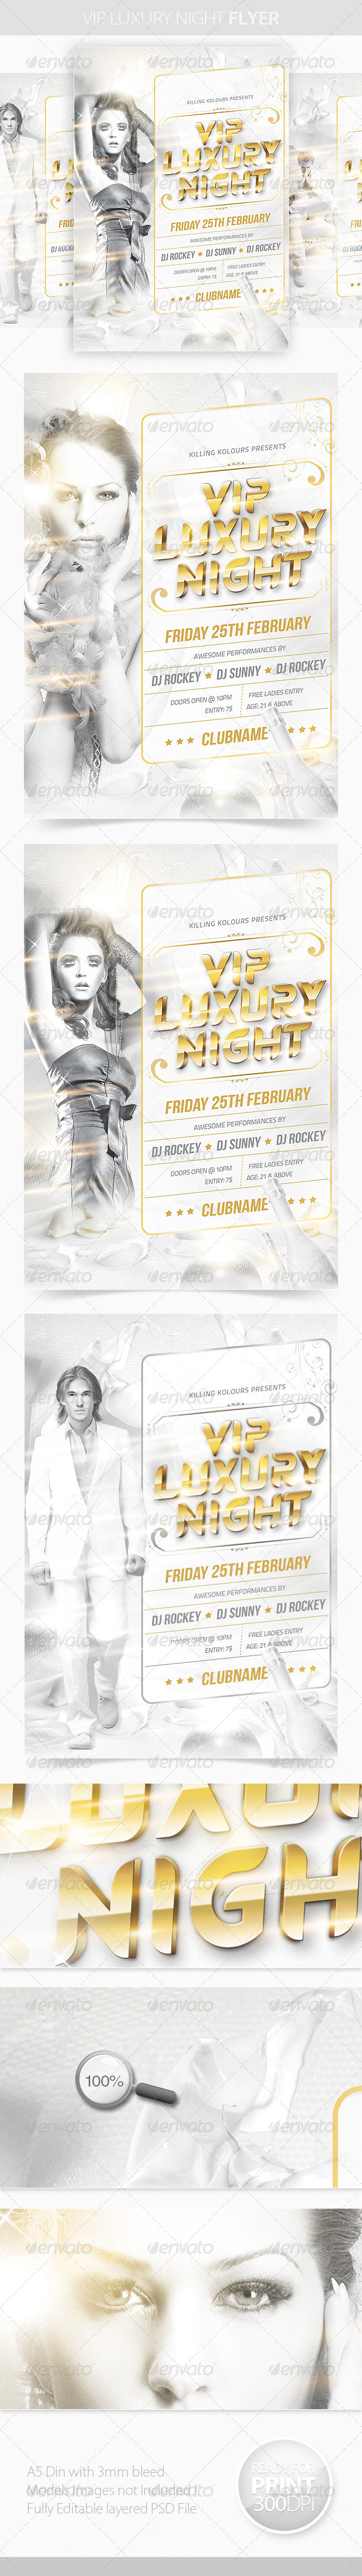 GraphicRiver VIP Luxury Night Flyer 4038533